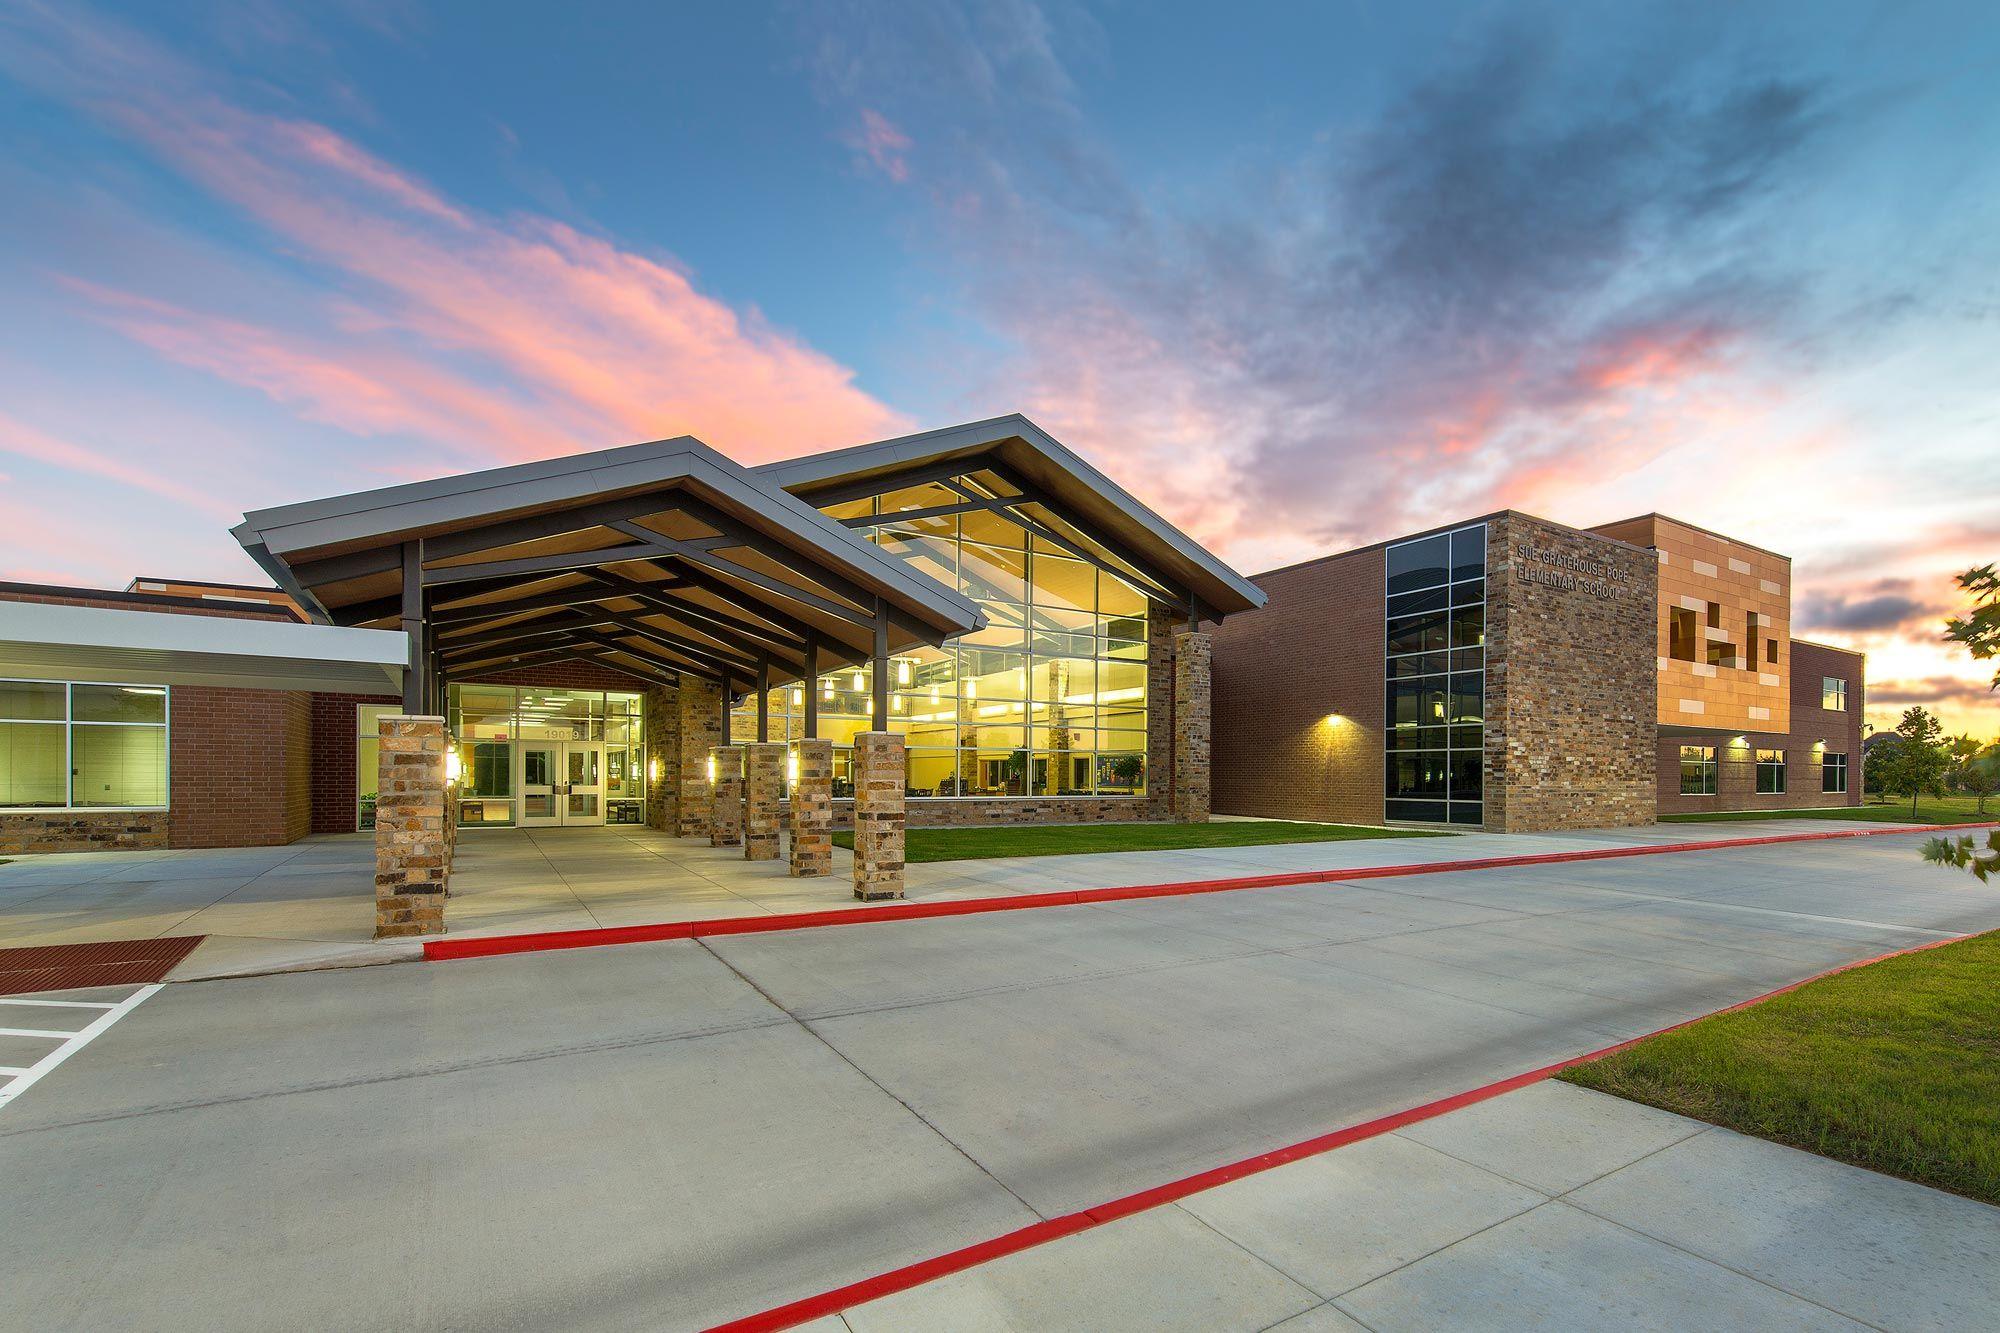 Modern Elementary School Buildings | www.pixshark.com ...